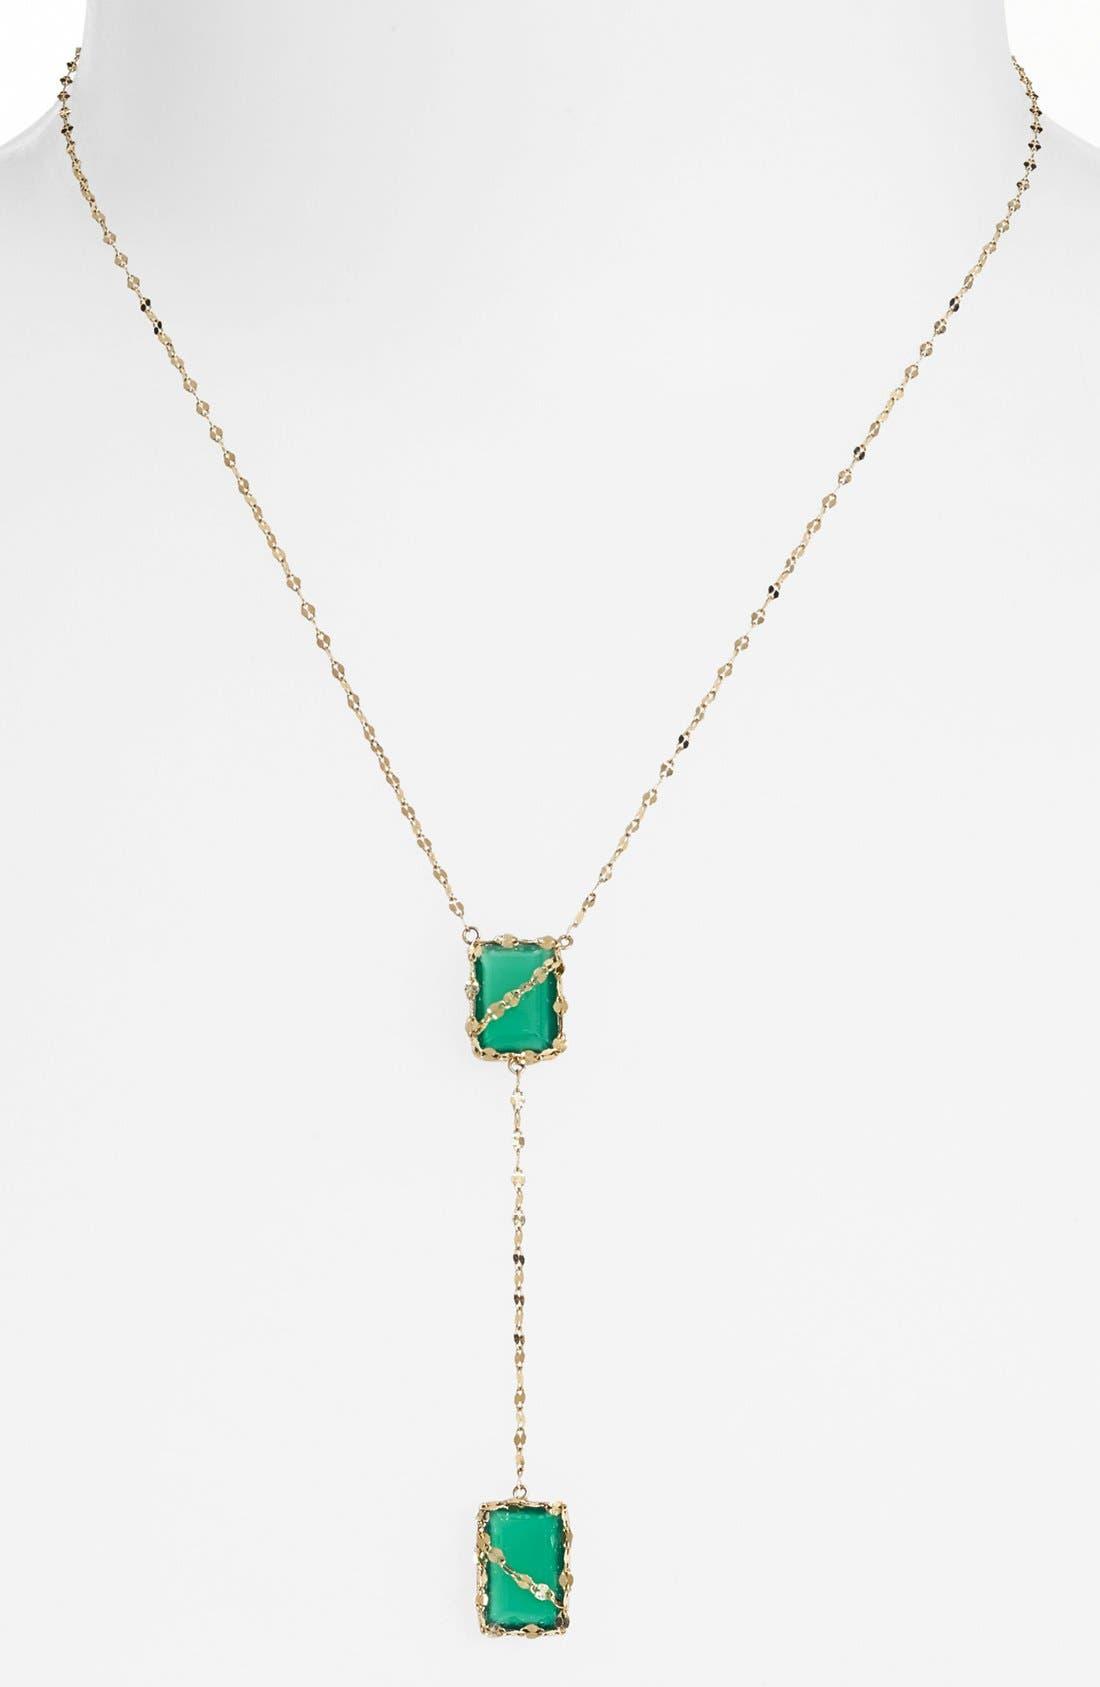 Main Image - Lana Jewelry 'Spellbound' Y-Necklace